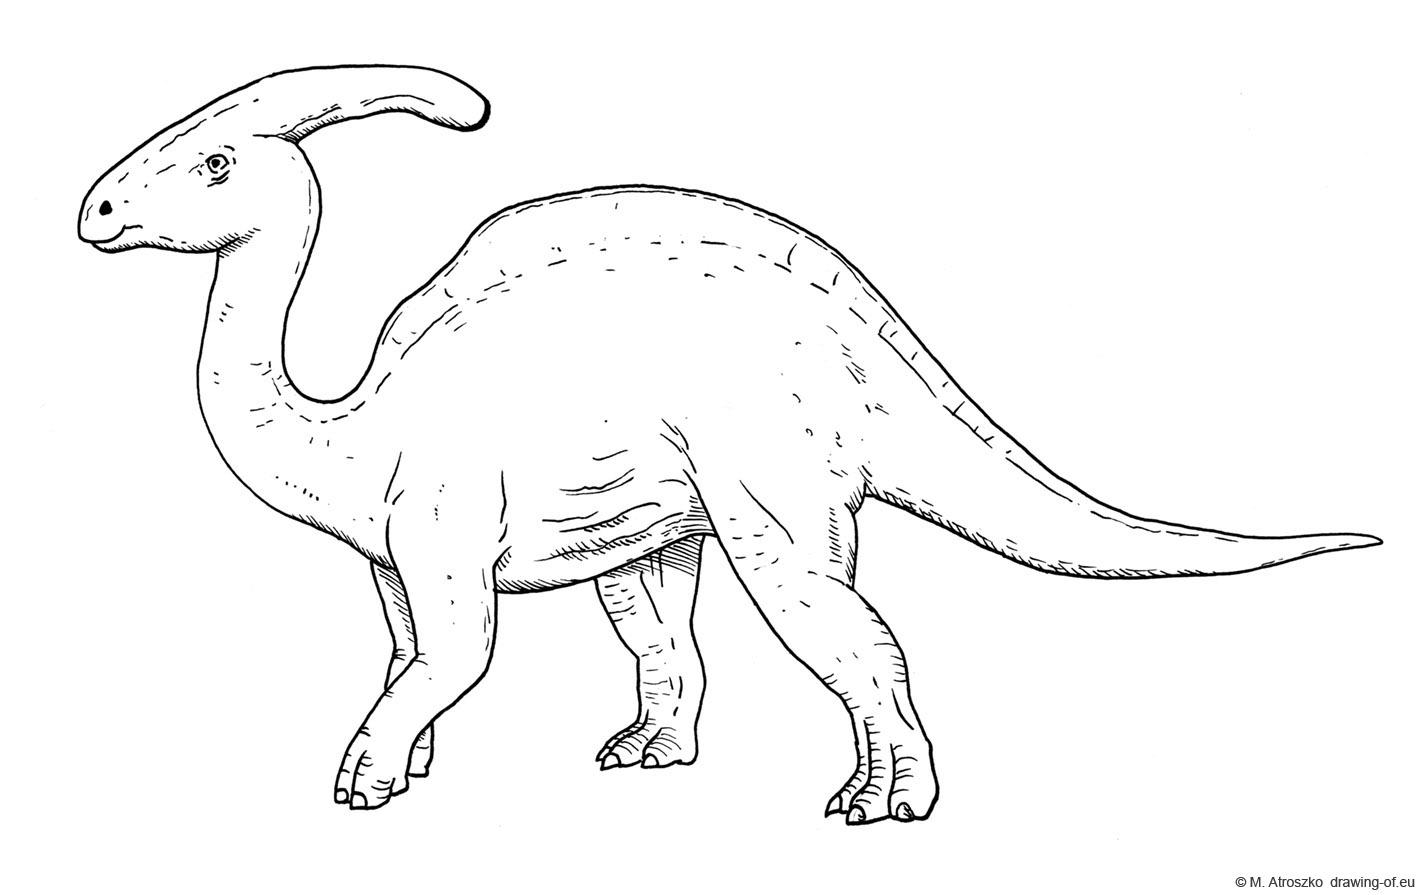 Parasaurolophus dibujo